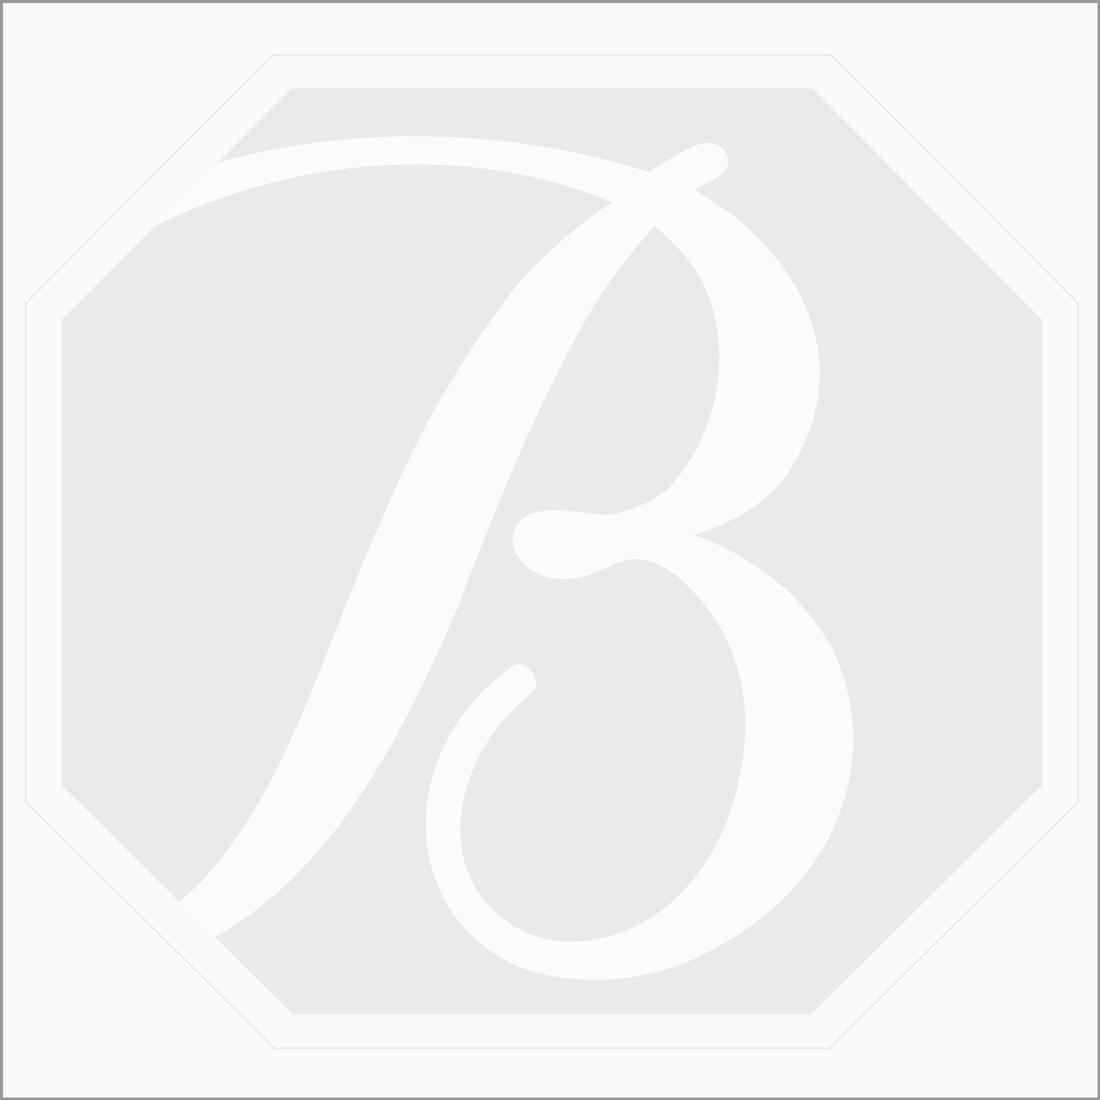 4 Pieces - Medium Tones Multi-Sapphire Rose Cut - 15 x 12 mm to 17.50 x 13 mm - 45.93 carats (MSRC1198)